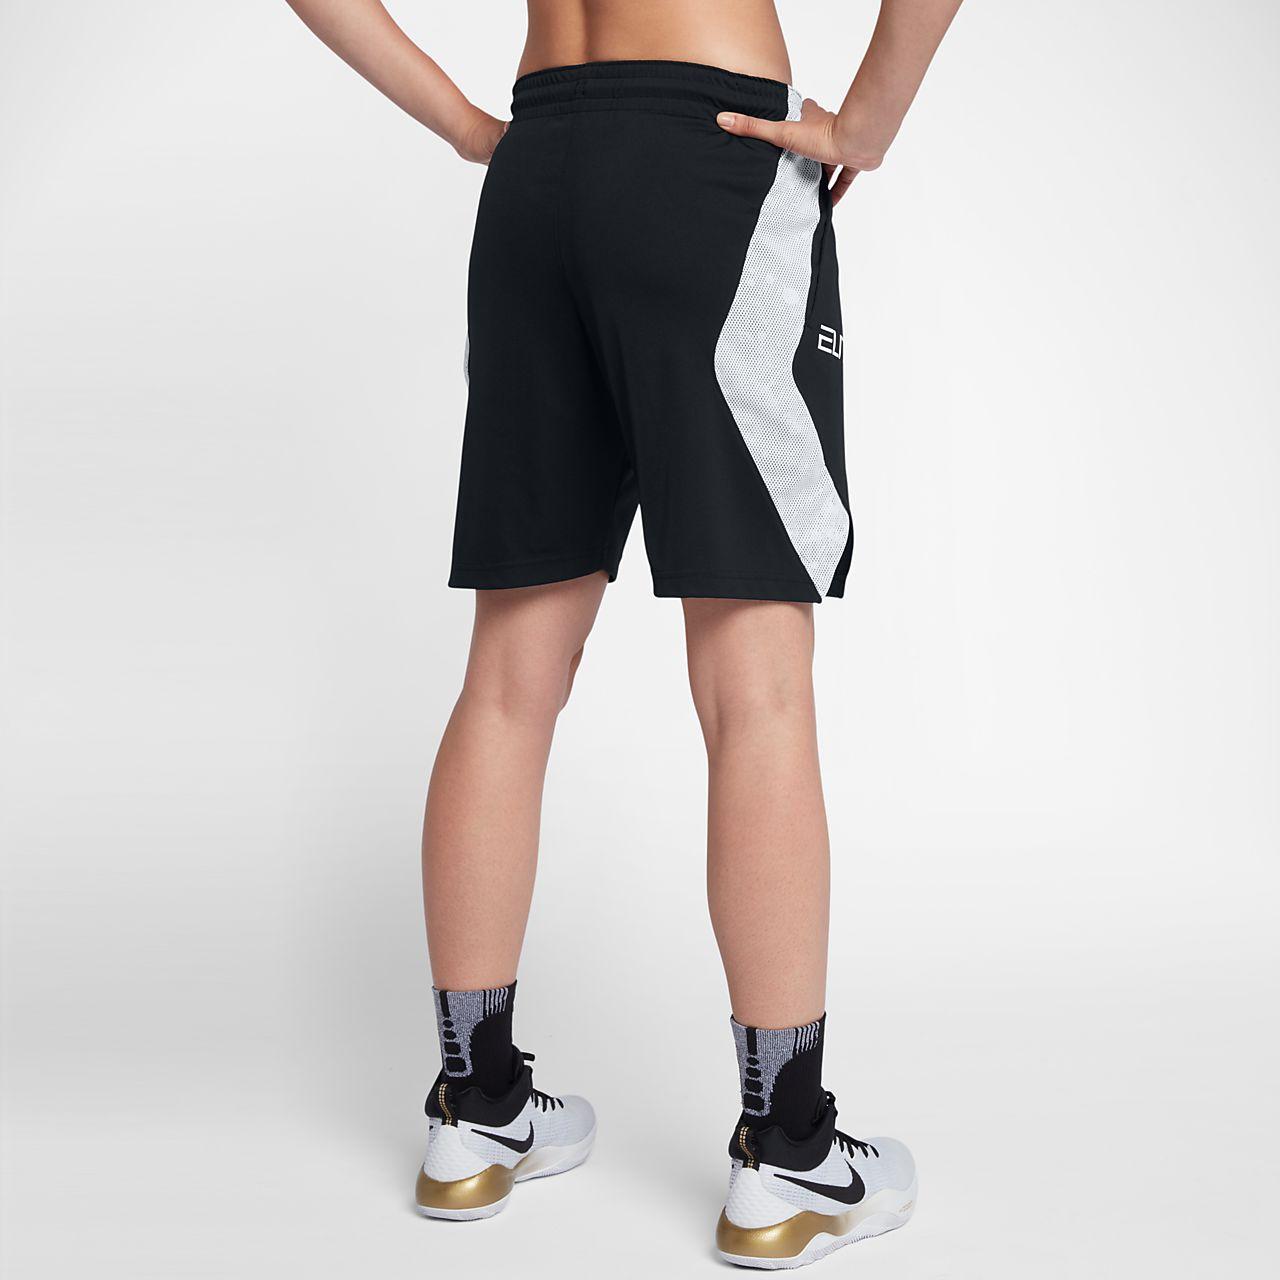 Mens basketball shorts on sale free shipping -  Nike Dry Elite Women S 9 Basketball Shorts